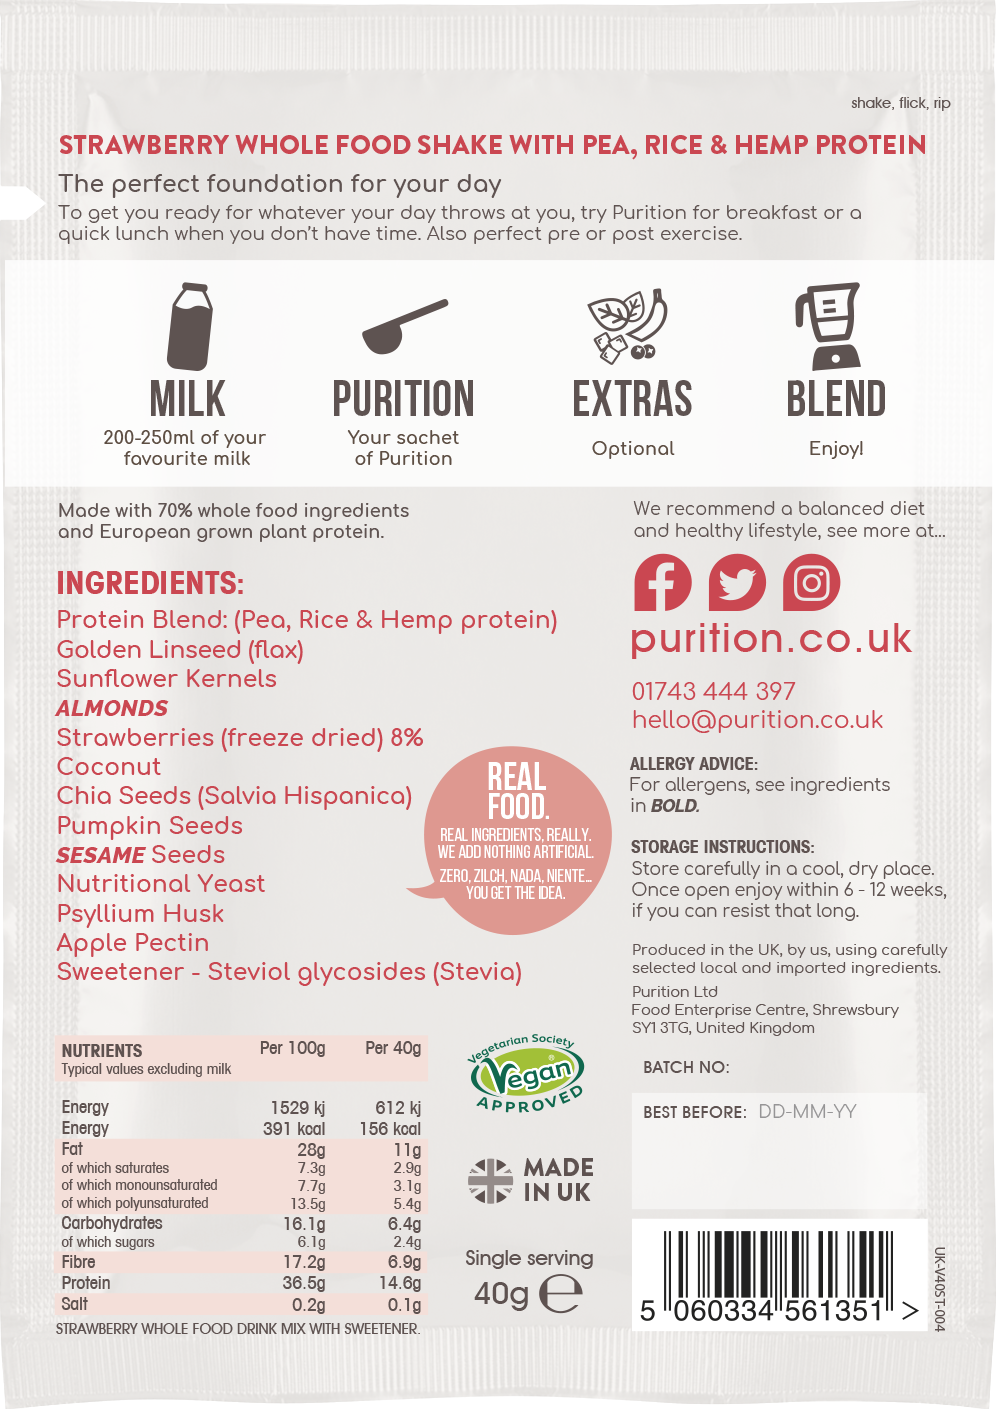 VEGAN Wholefood Plant Nutrition With Strawberry SINGLE SACHET 40g